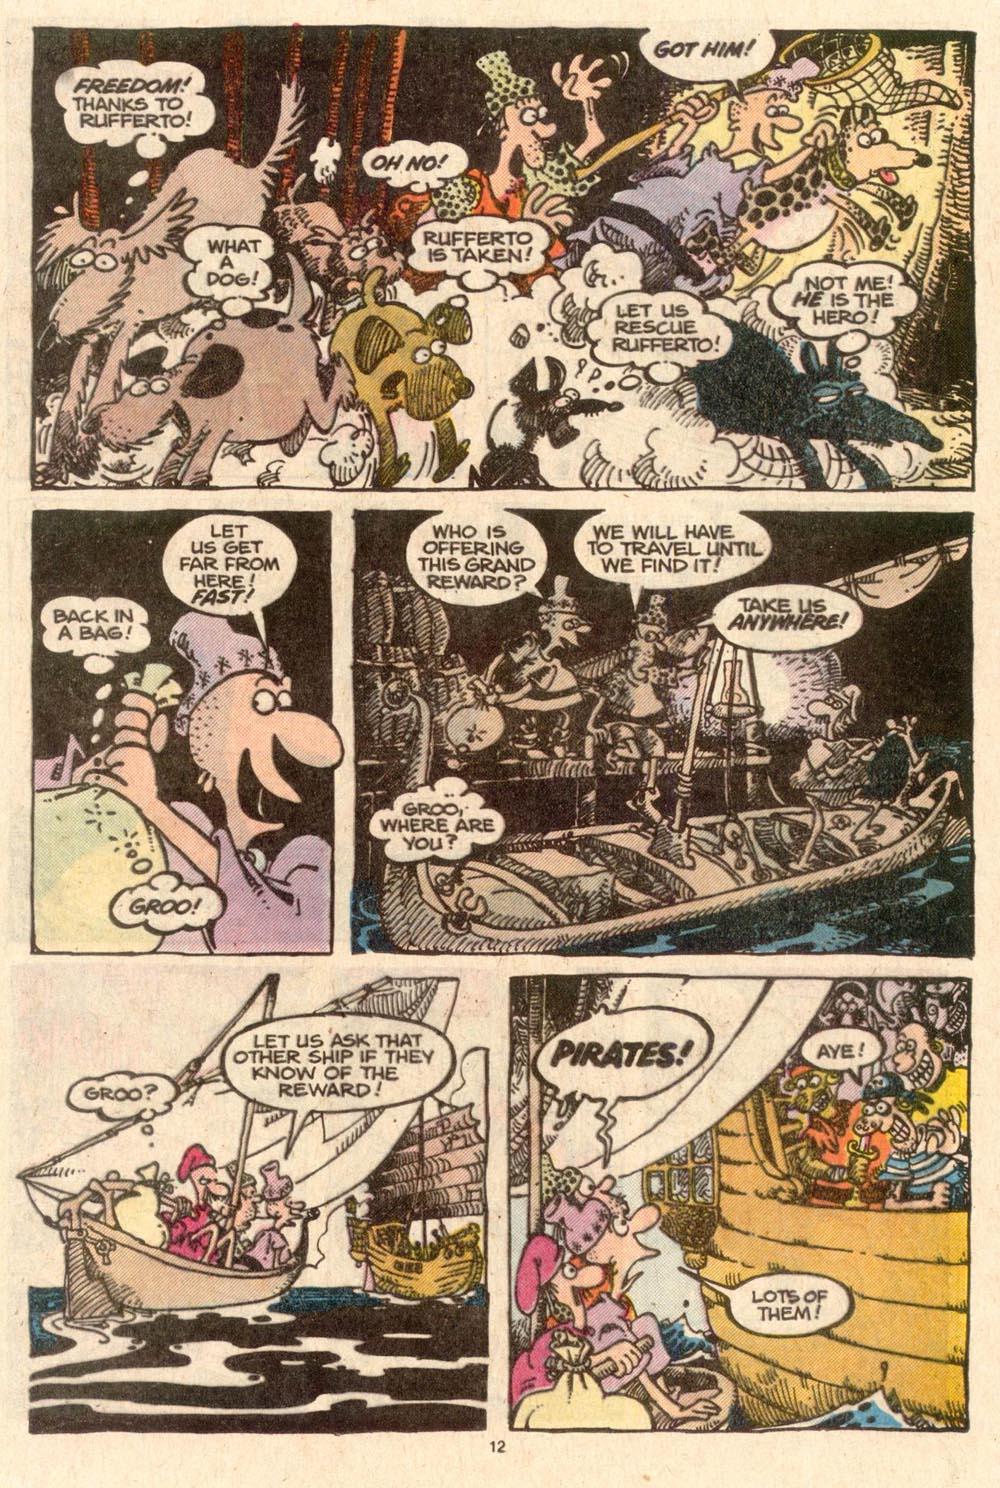 Read online Sergio Aragonés Groo the Wanderer comic -  Issue #45 - 12